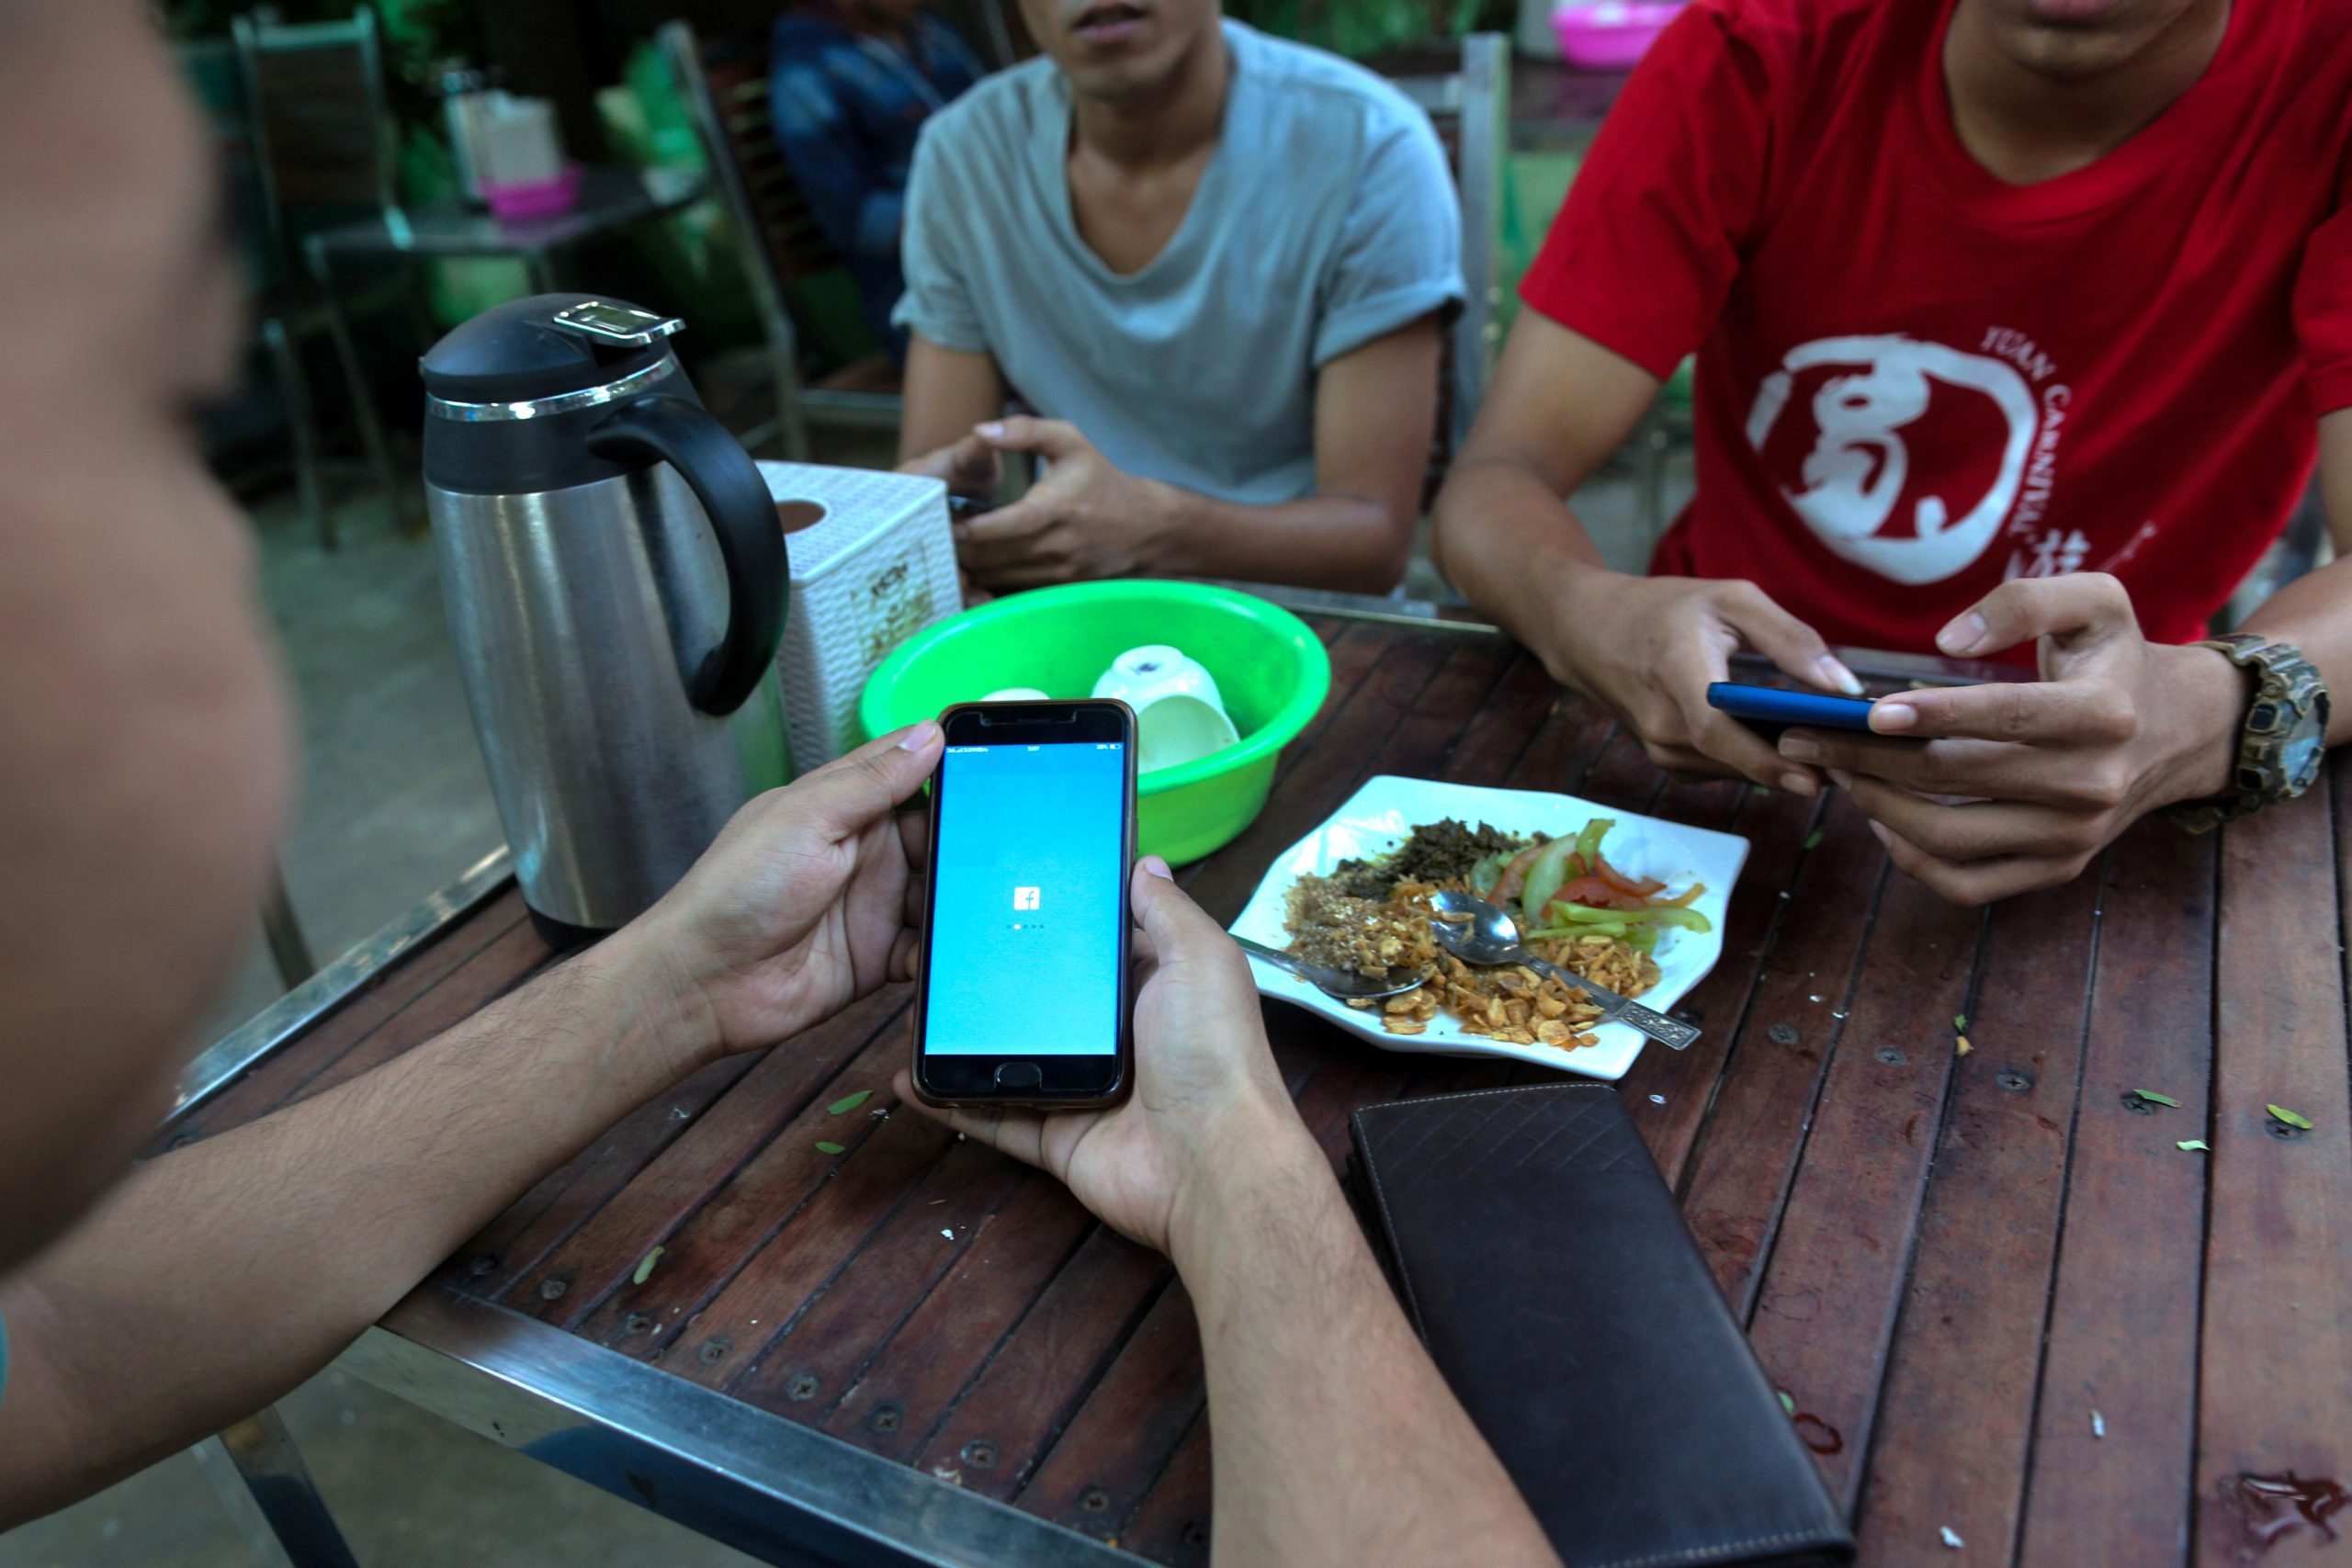 Myanmar internet telecoms disinformation Facebook